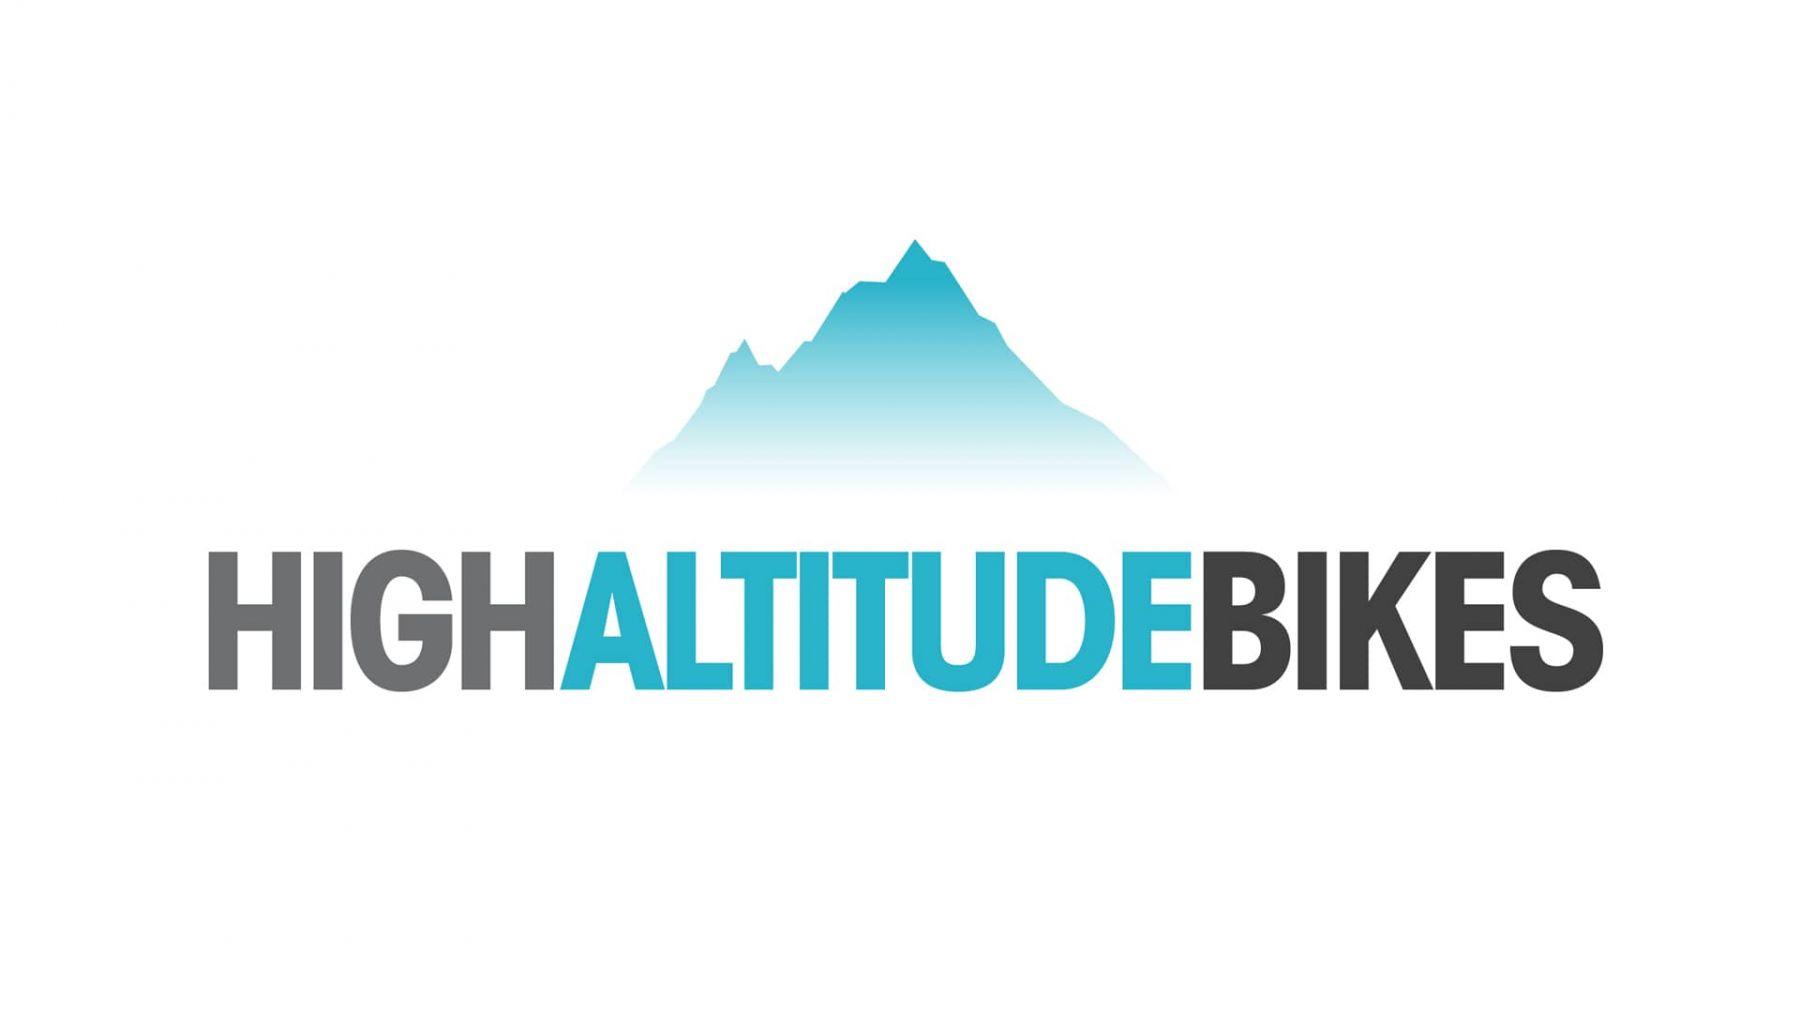 High Altitude Bikes logo design